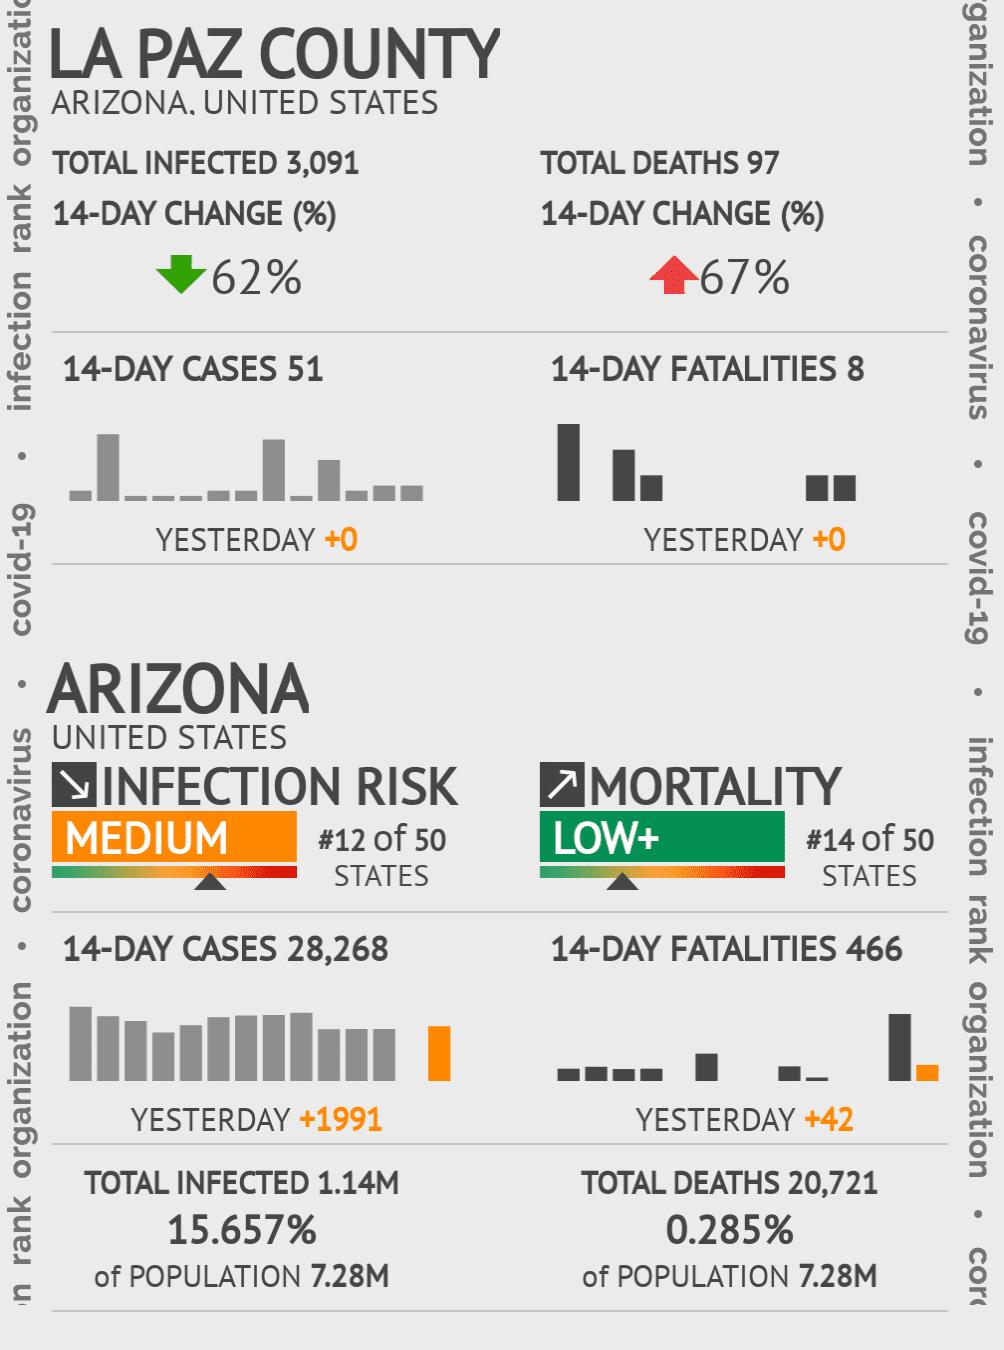 La Paz County Coronavirus Covid-19 Risk of Infection on December 04, 2020